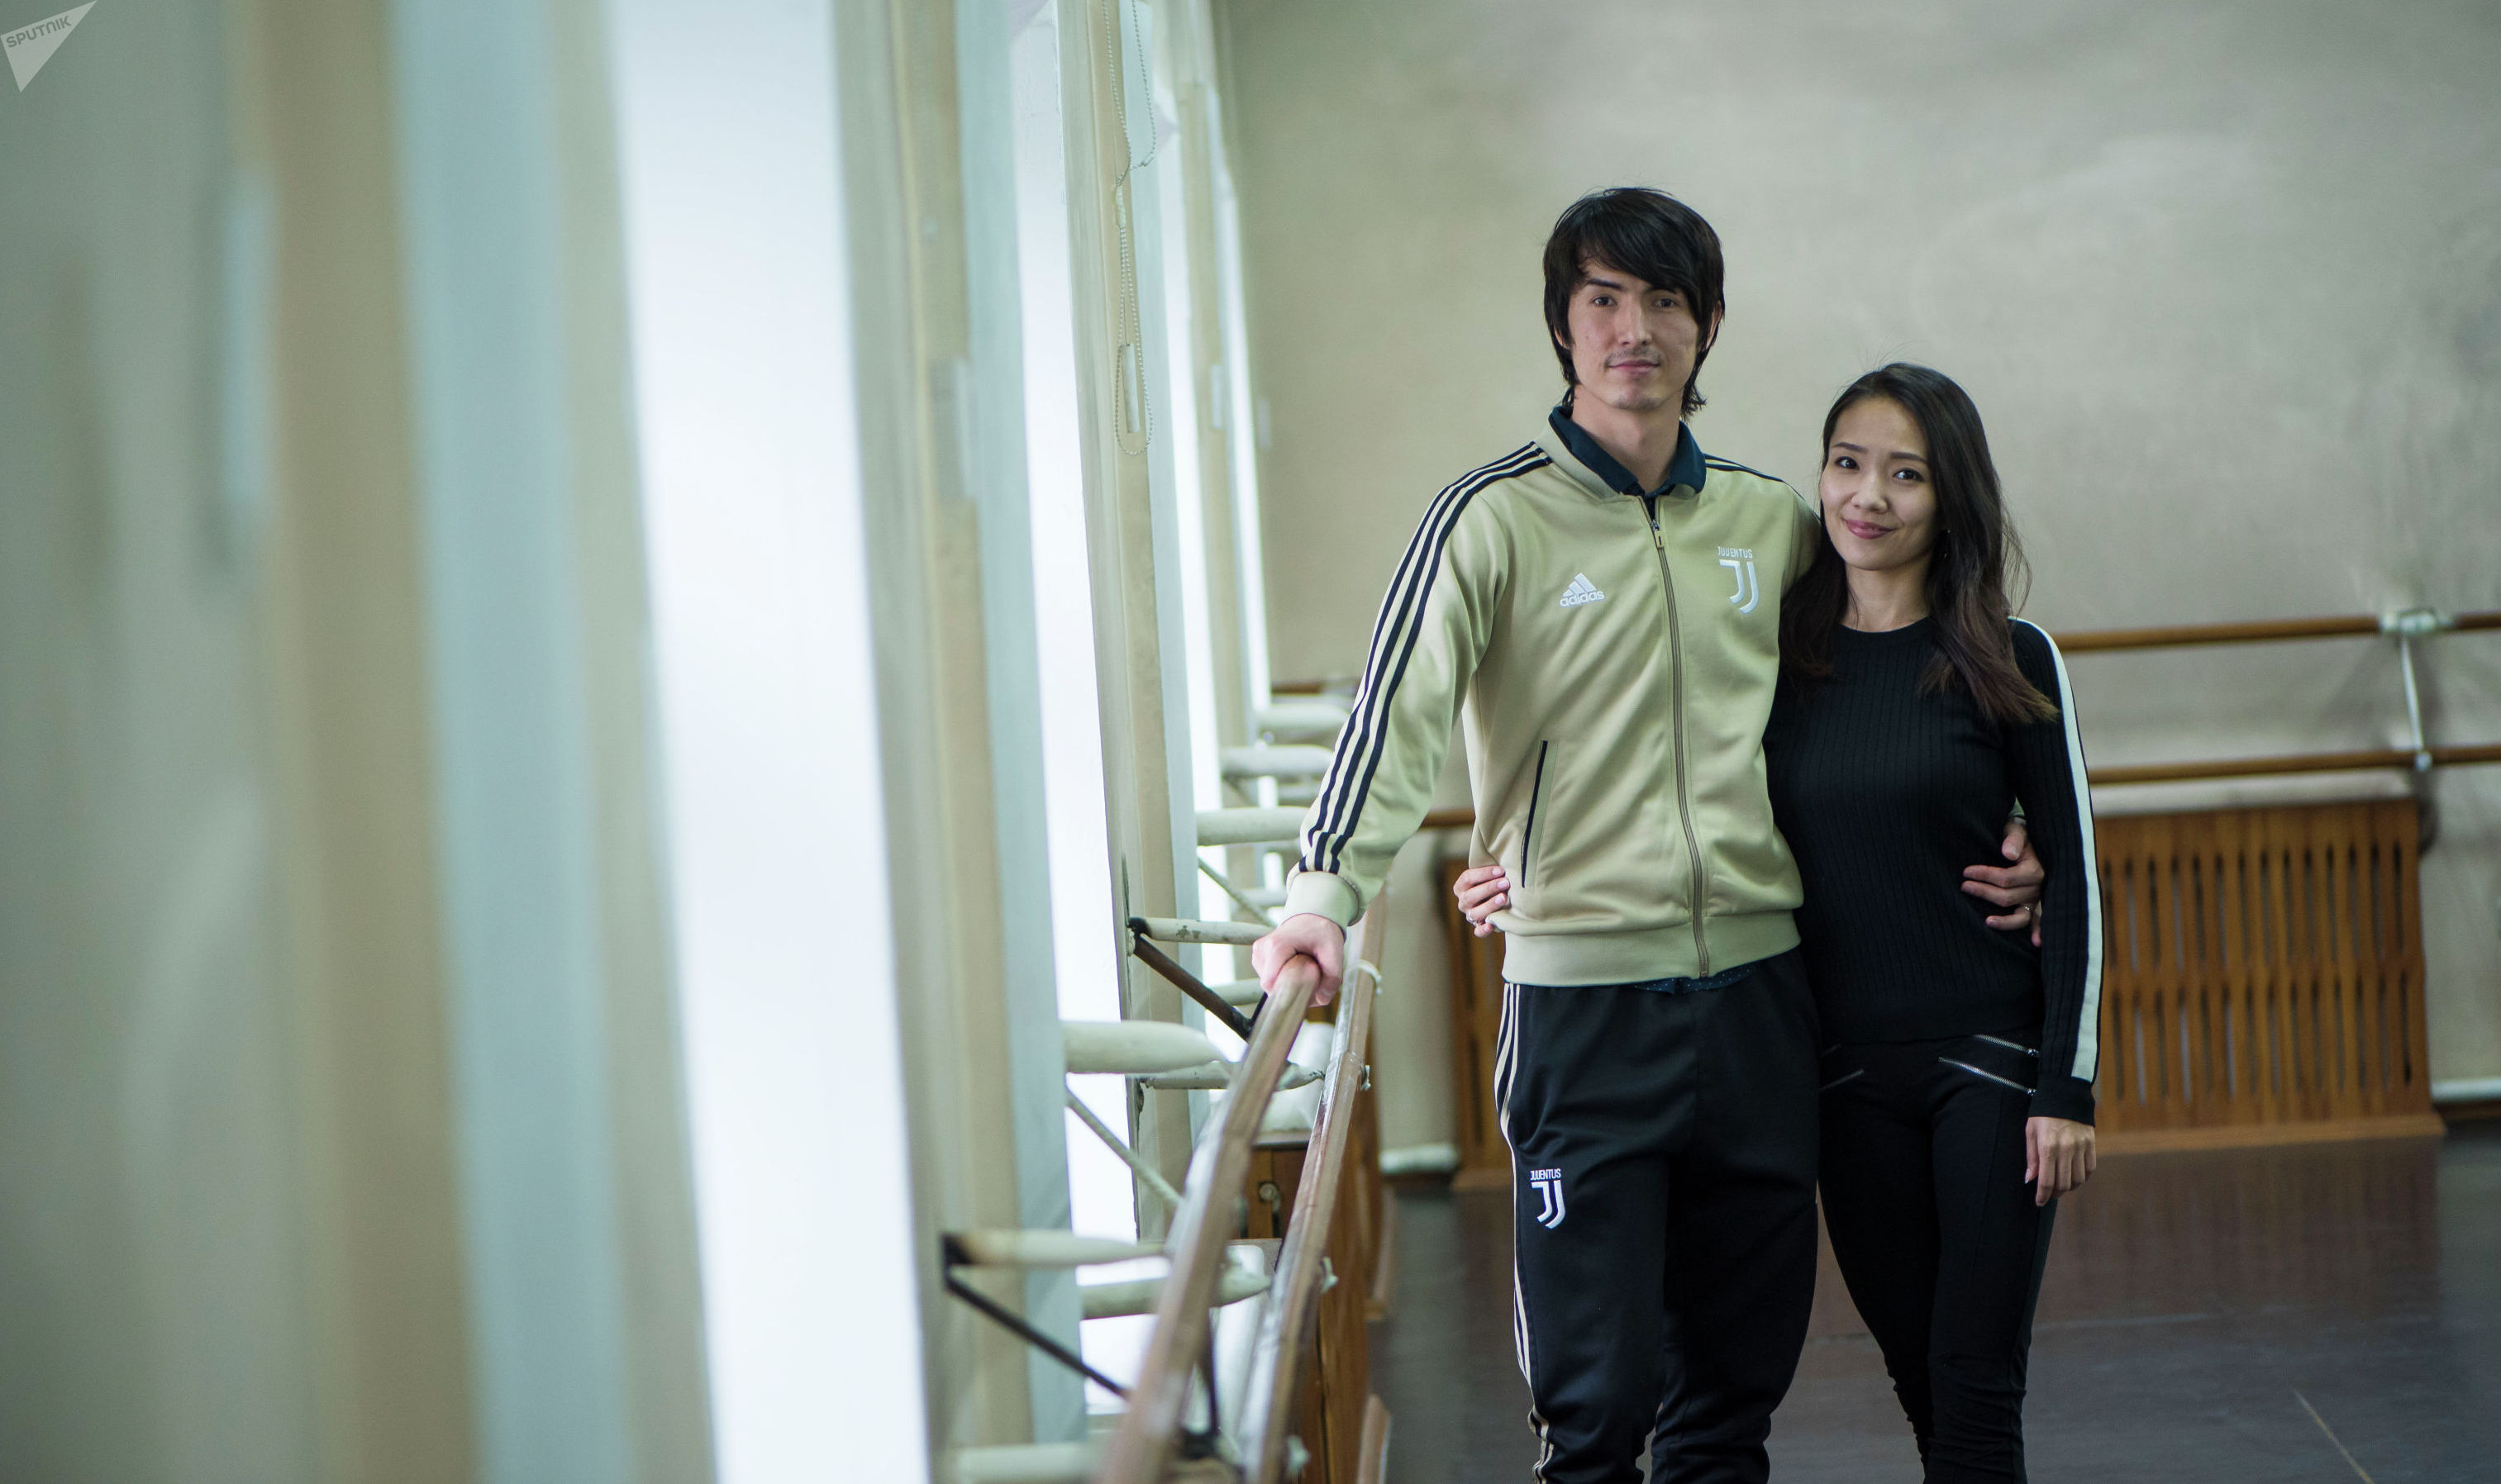 Кыргызстанец Атабек Садыркулов и японка Мэгуми Мацумото